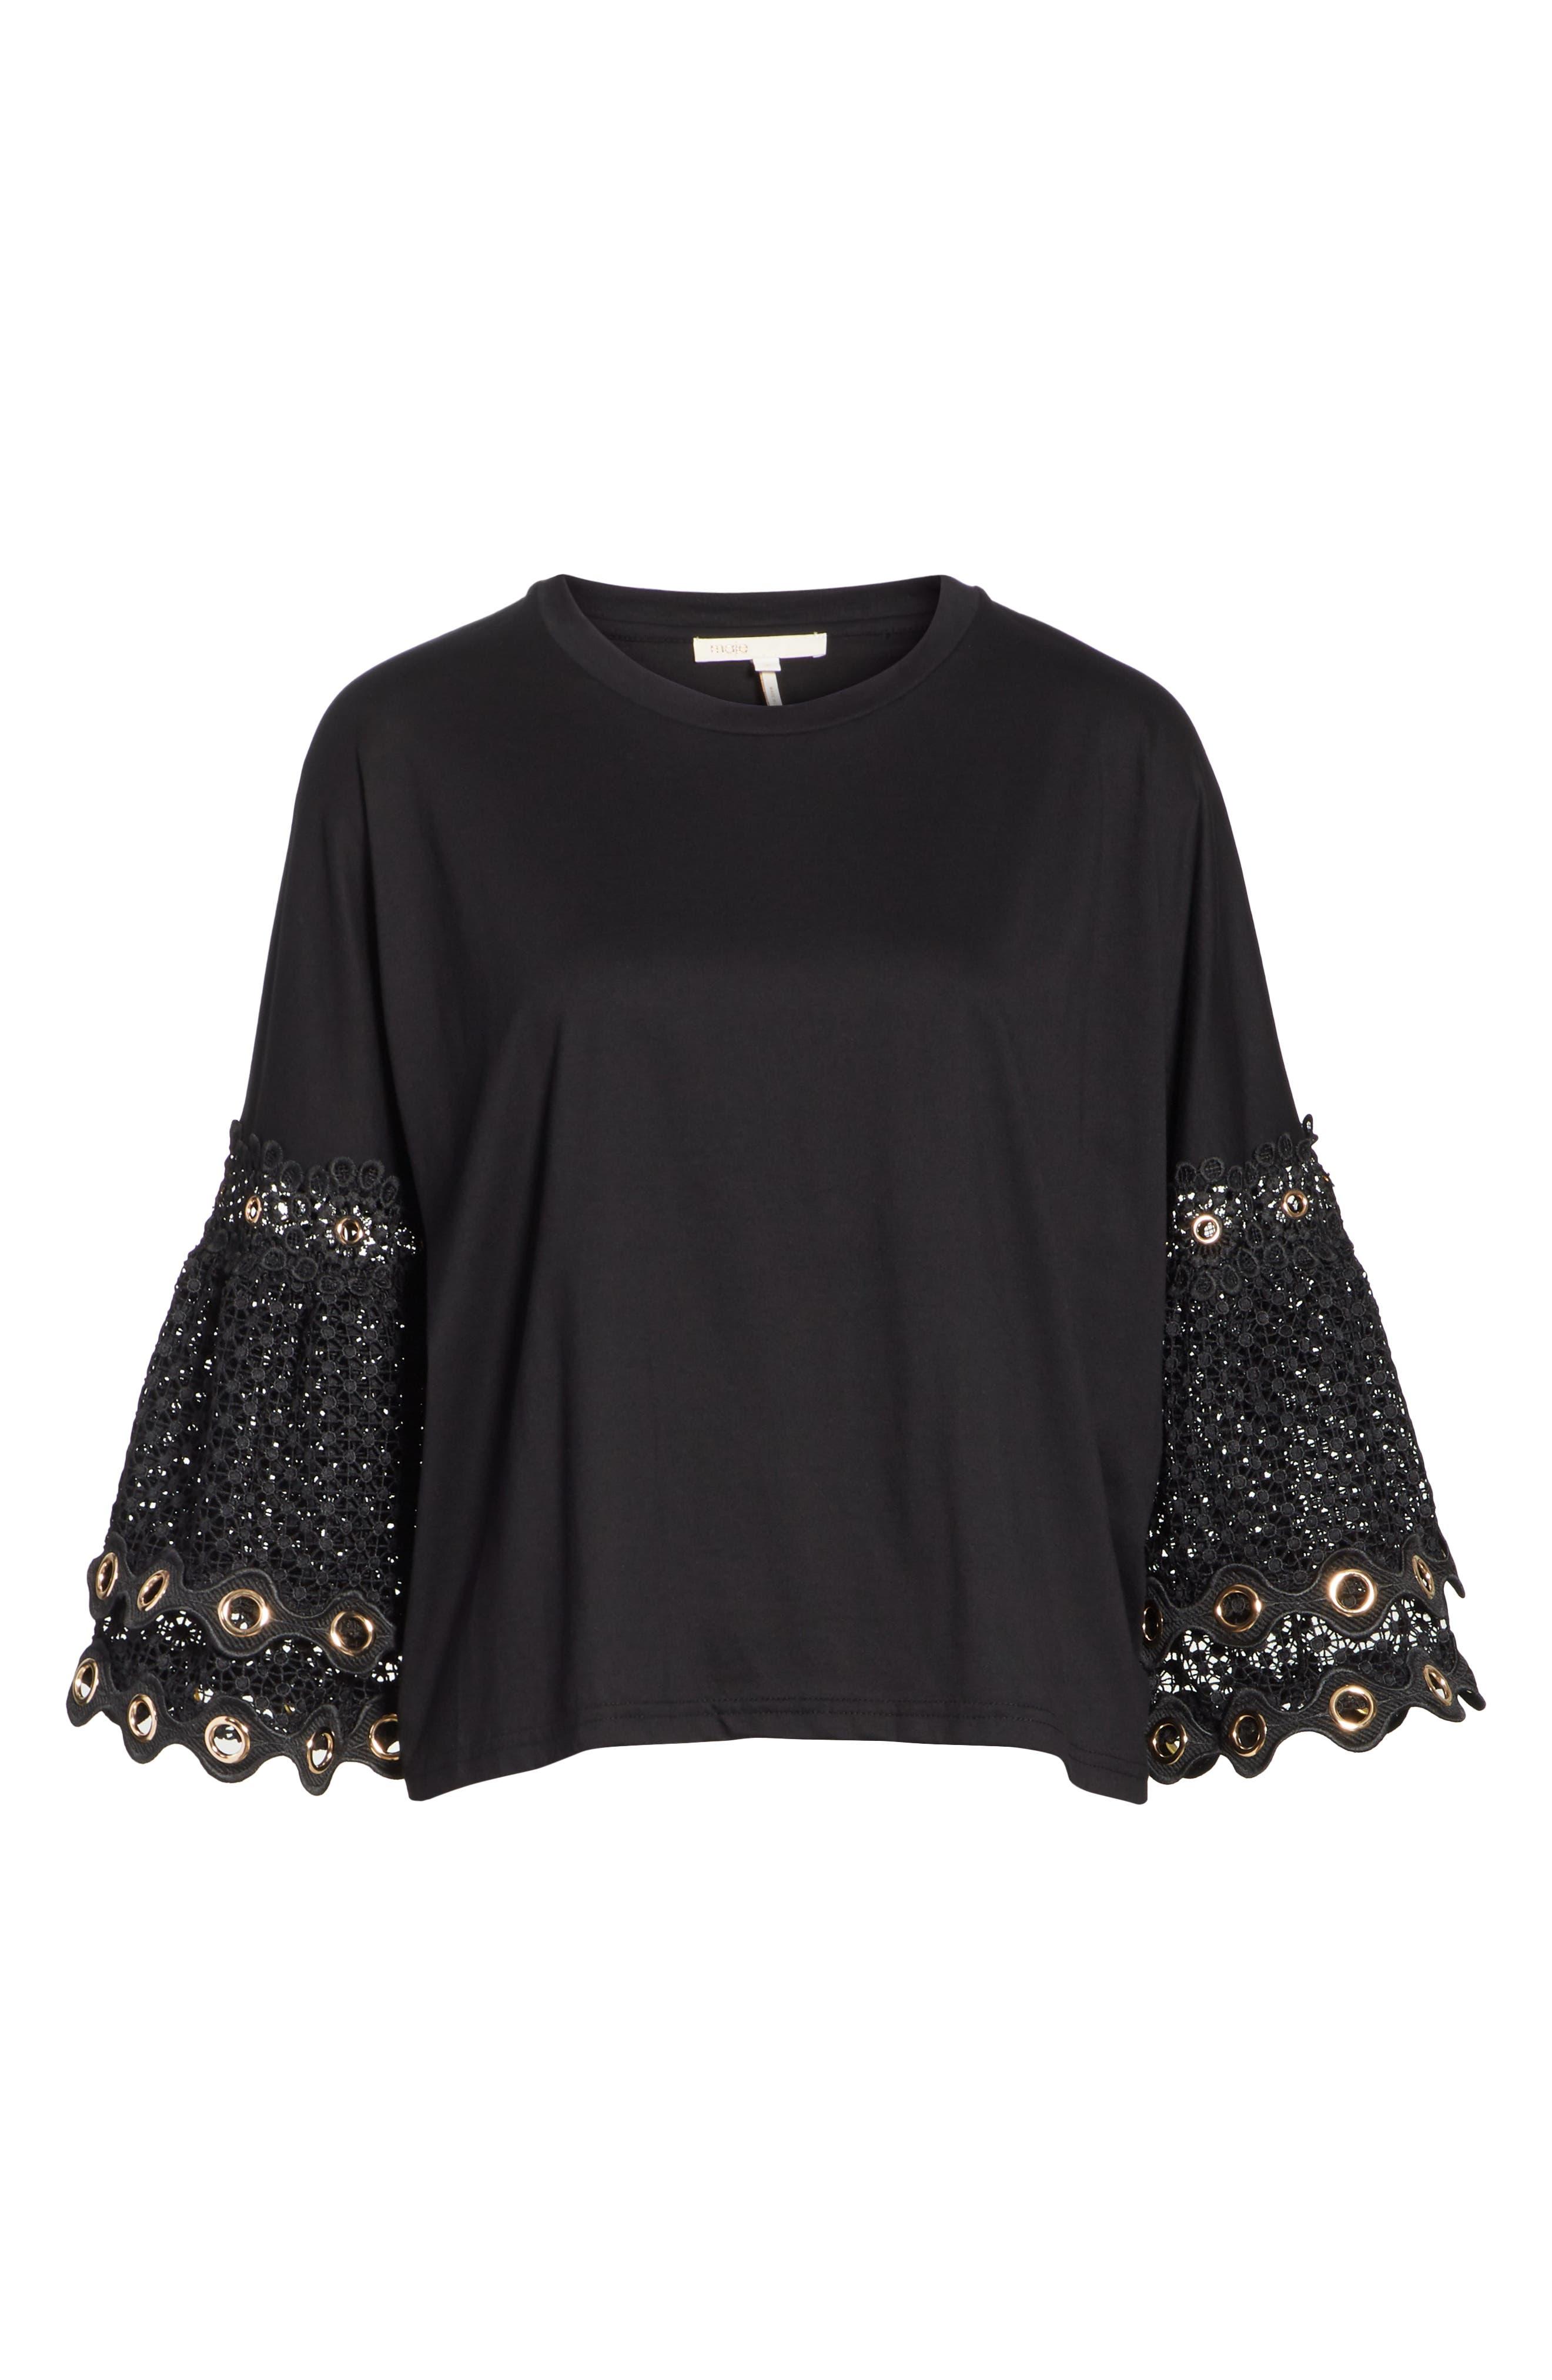 Lace Sleeve Top,                             Alternate thumbnail 6, color,                             Black